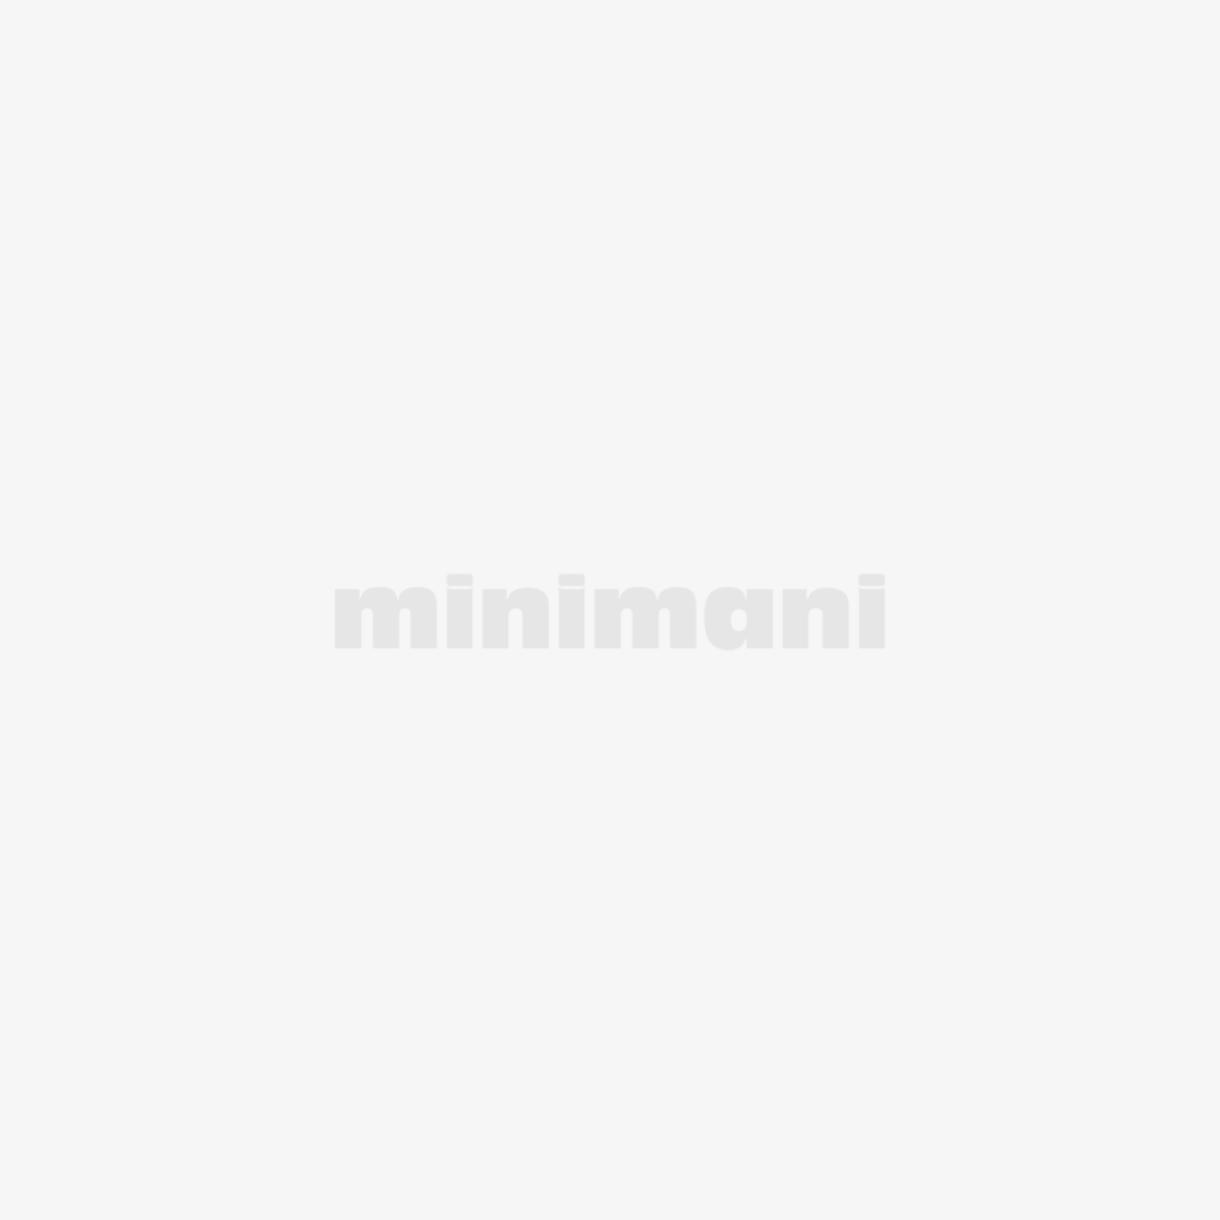 AIRAM VANAMO VÄLITILAVALAISIN 108 8W G5 3000K